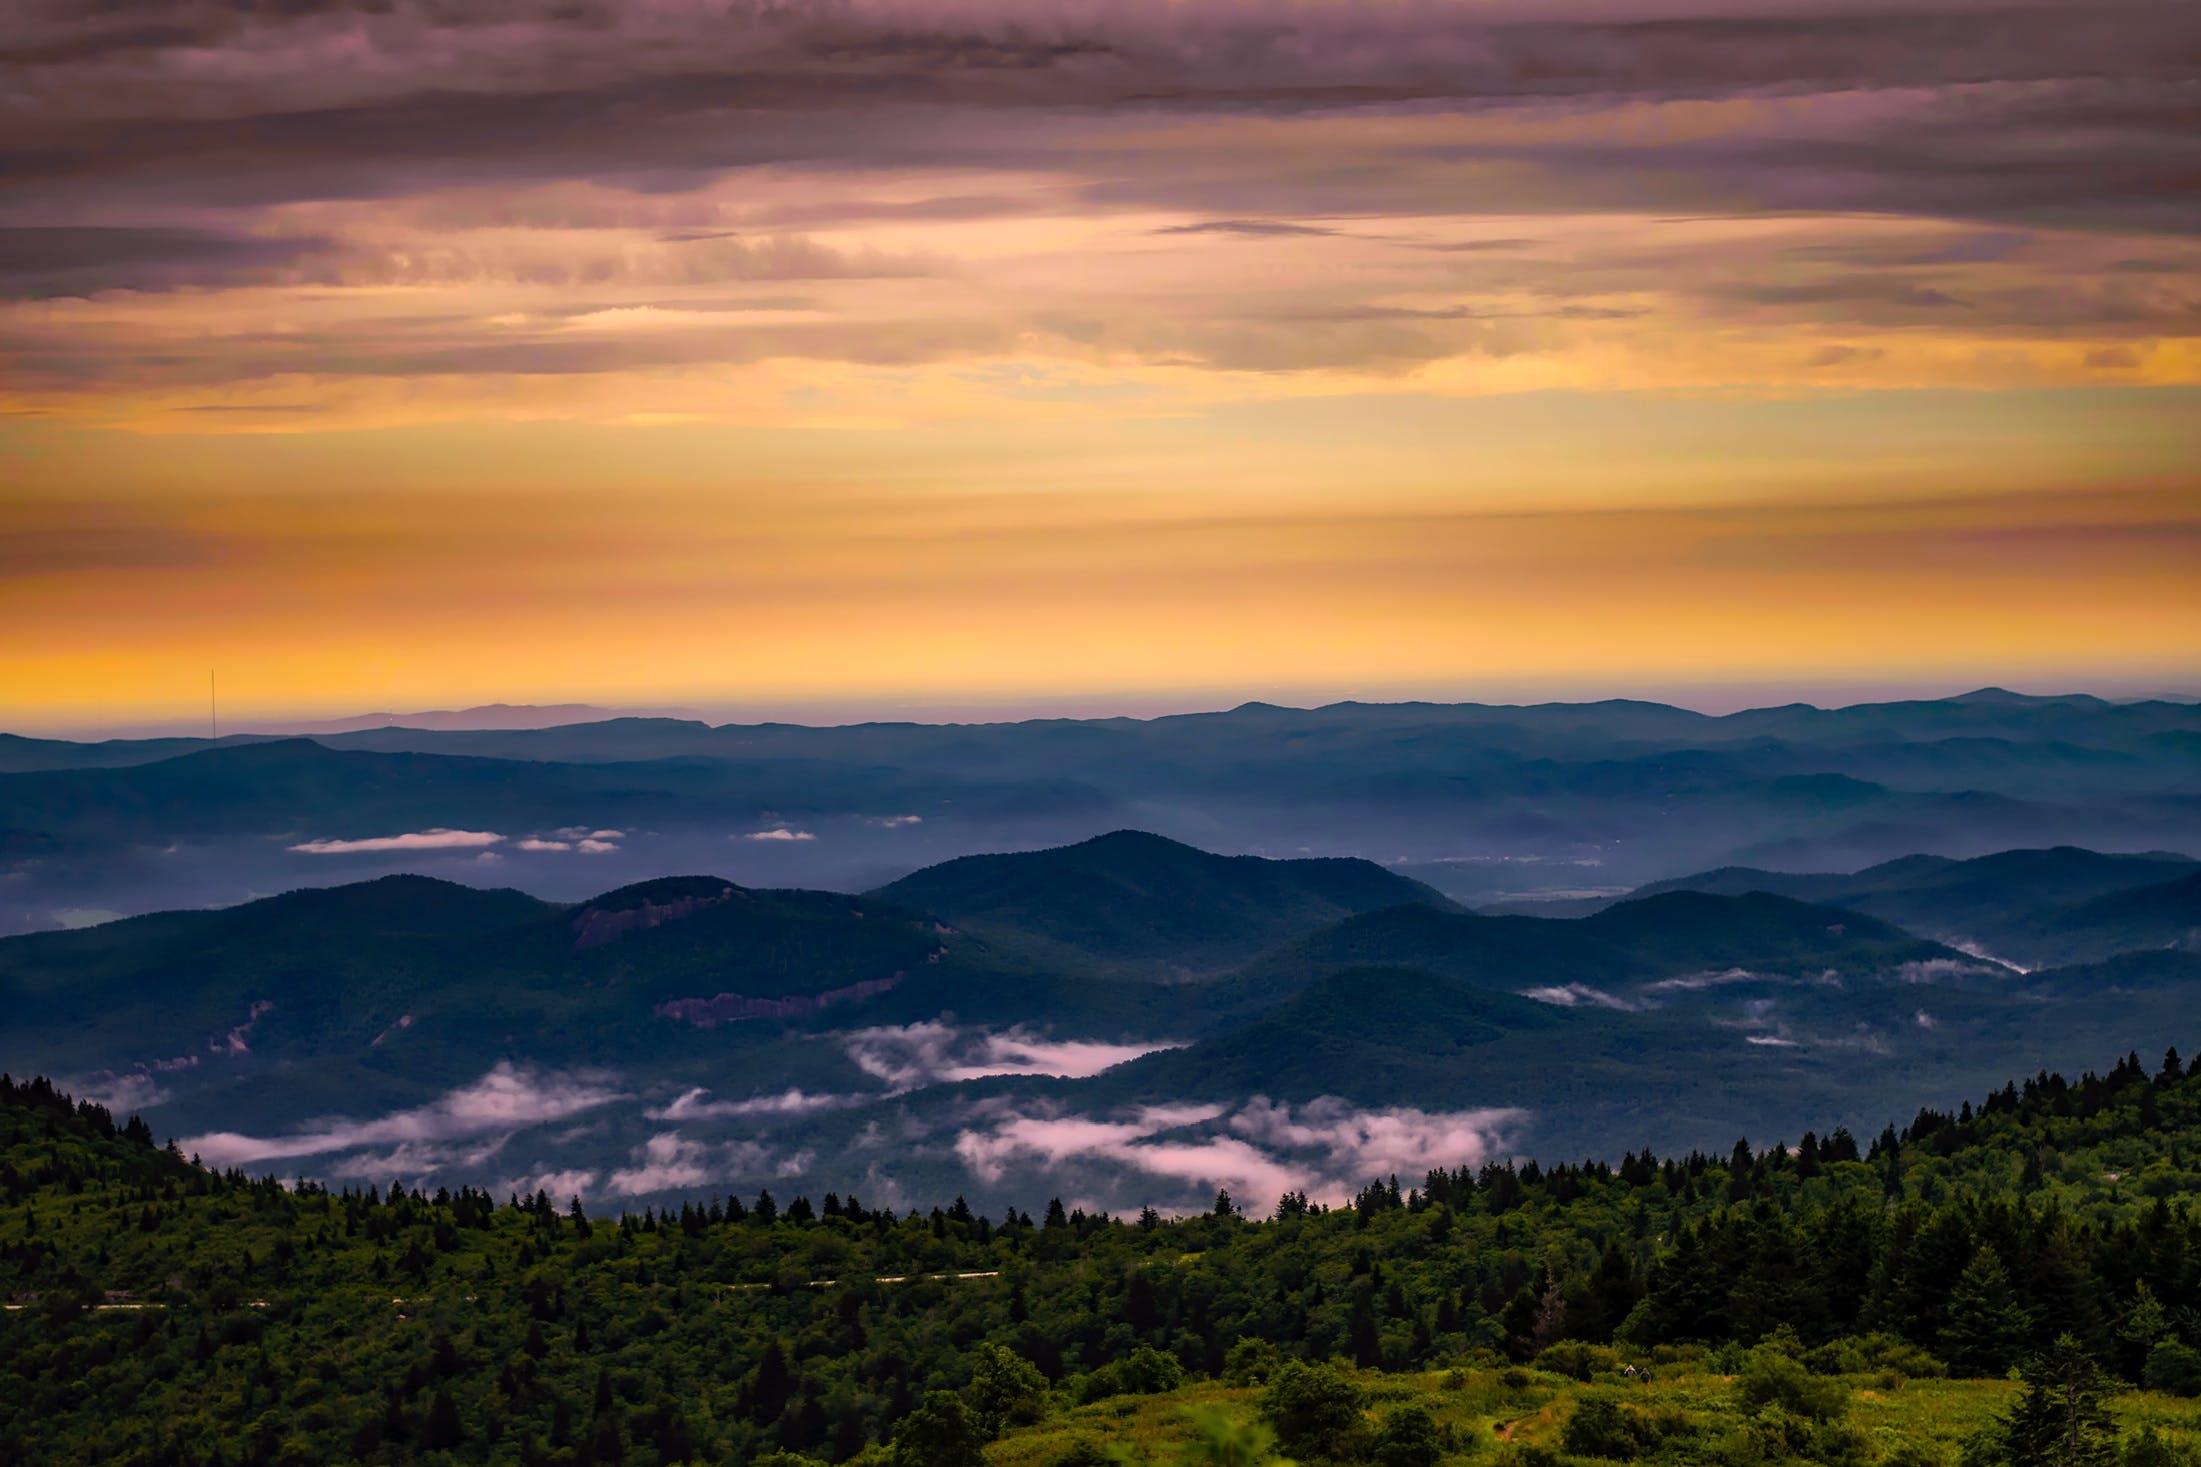 Kostenloses Stock Foto zu dämmerung, landschaft, berge, natur